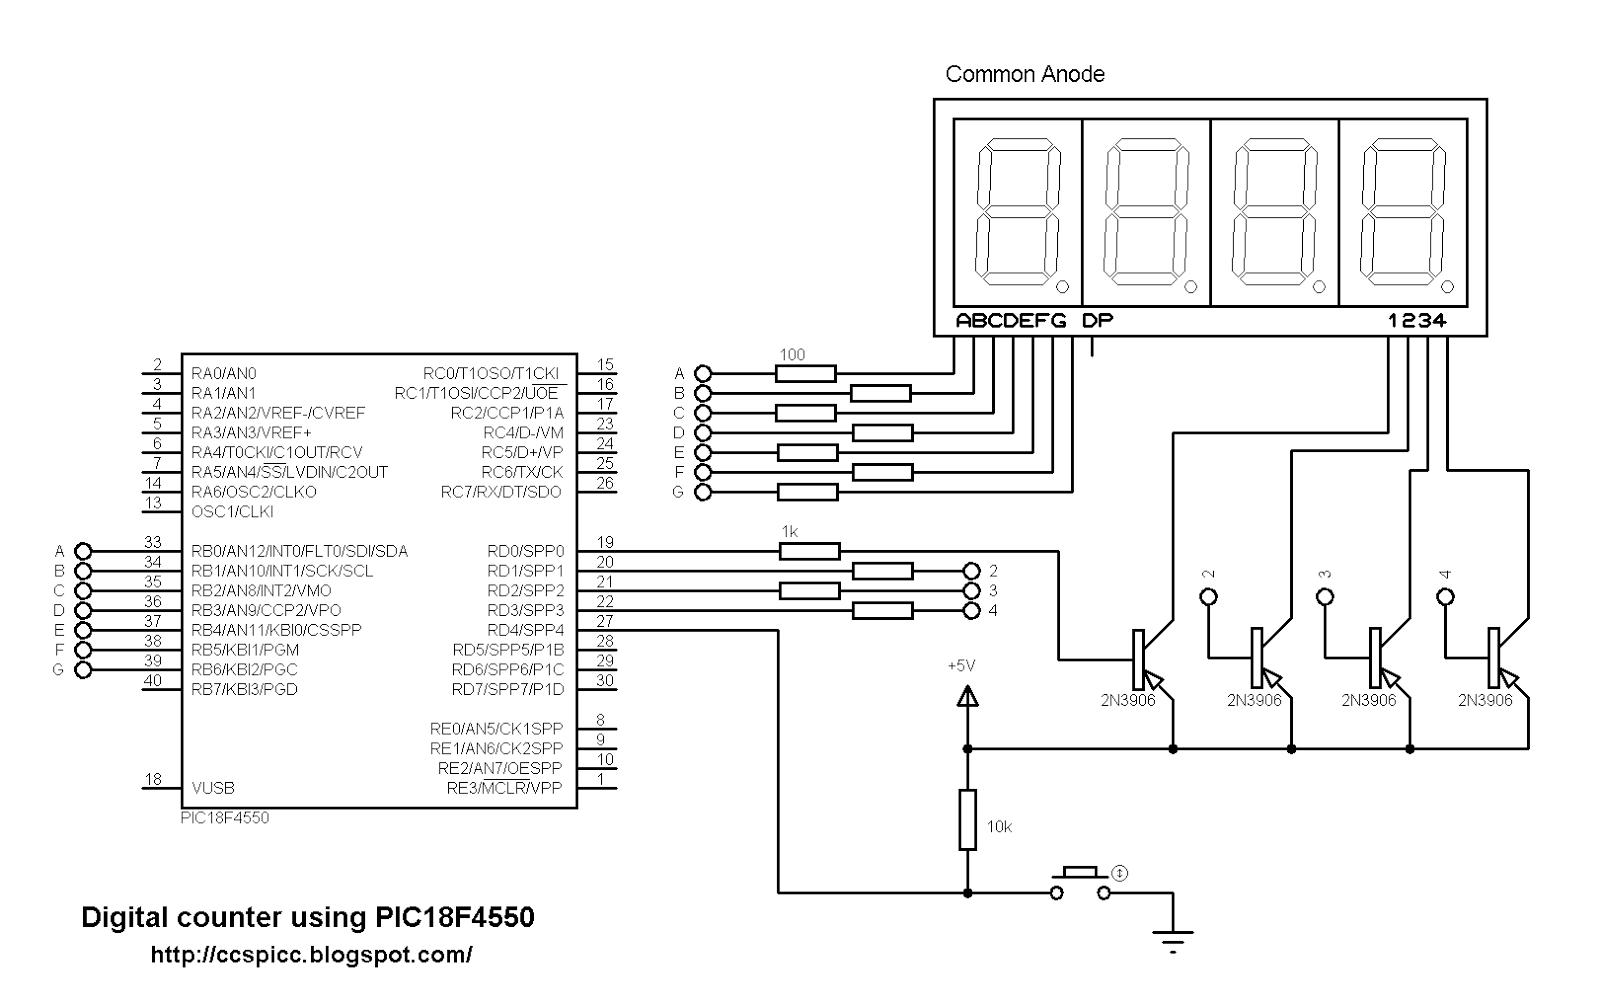 555 On Delay Timer Relay Circuit 7 Segment Display With Aemc Cbi 1 Breaker Tracer And Identifier Ebay Digital Counter Schematic Dice Elsavadorla